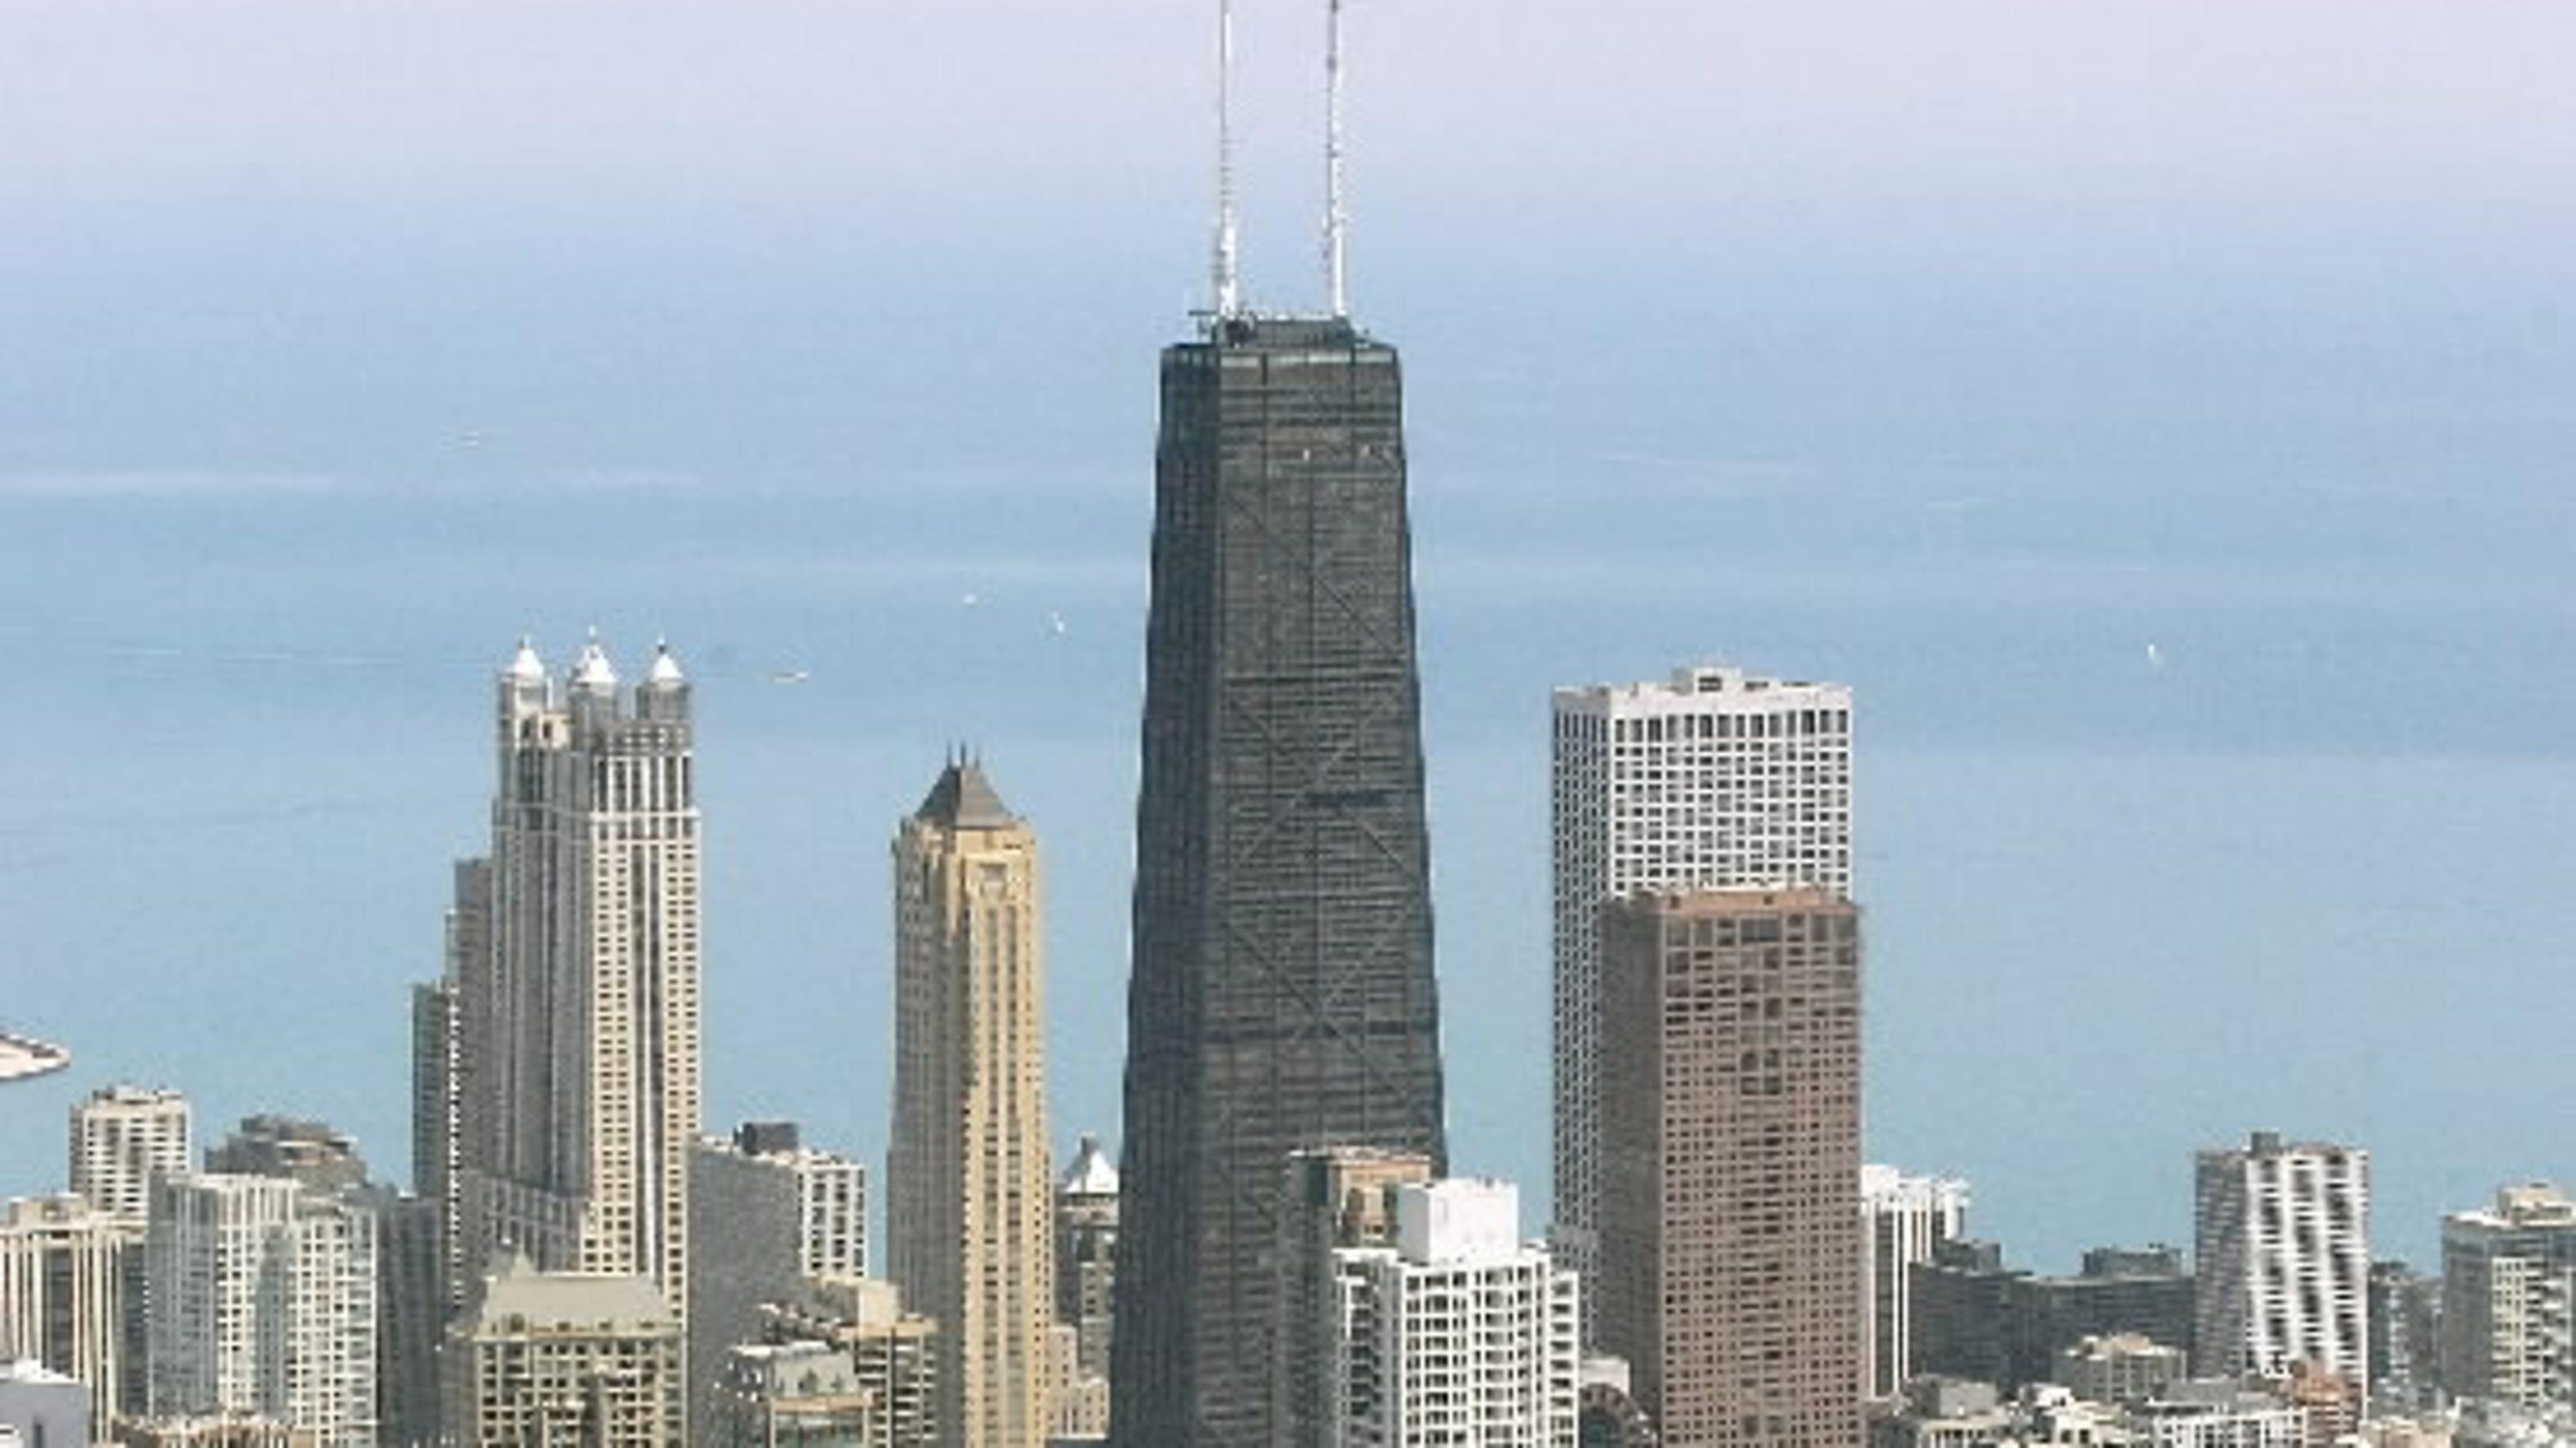 Elevator in Chicago's former Hancock building falls 84 floors  Hancock